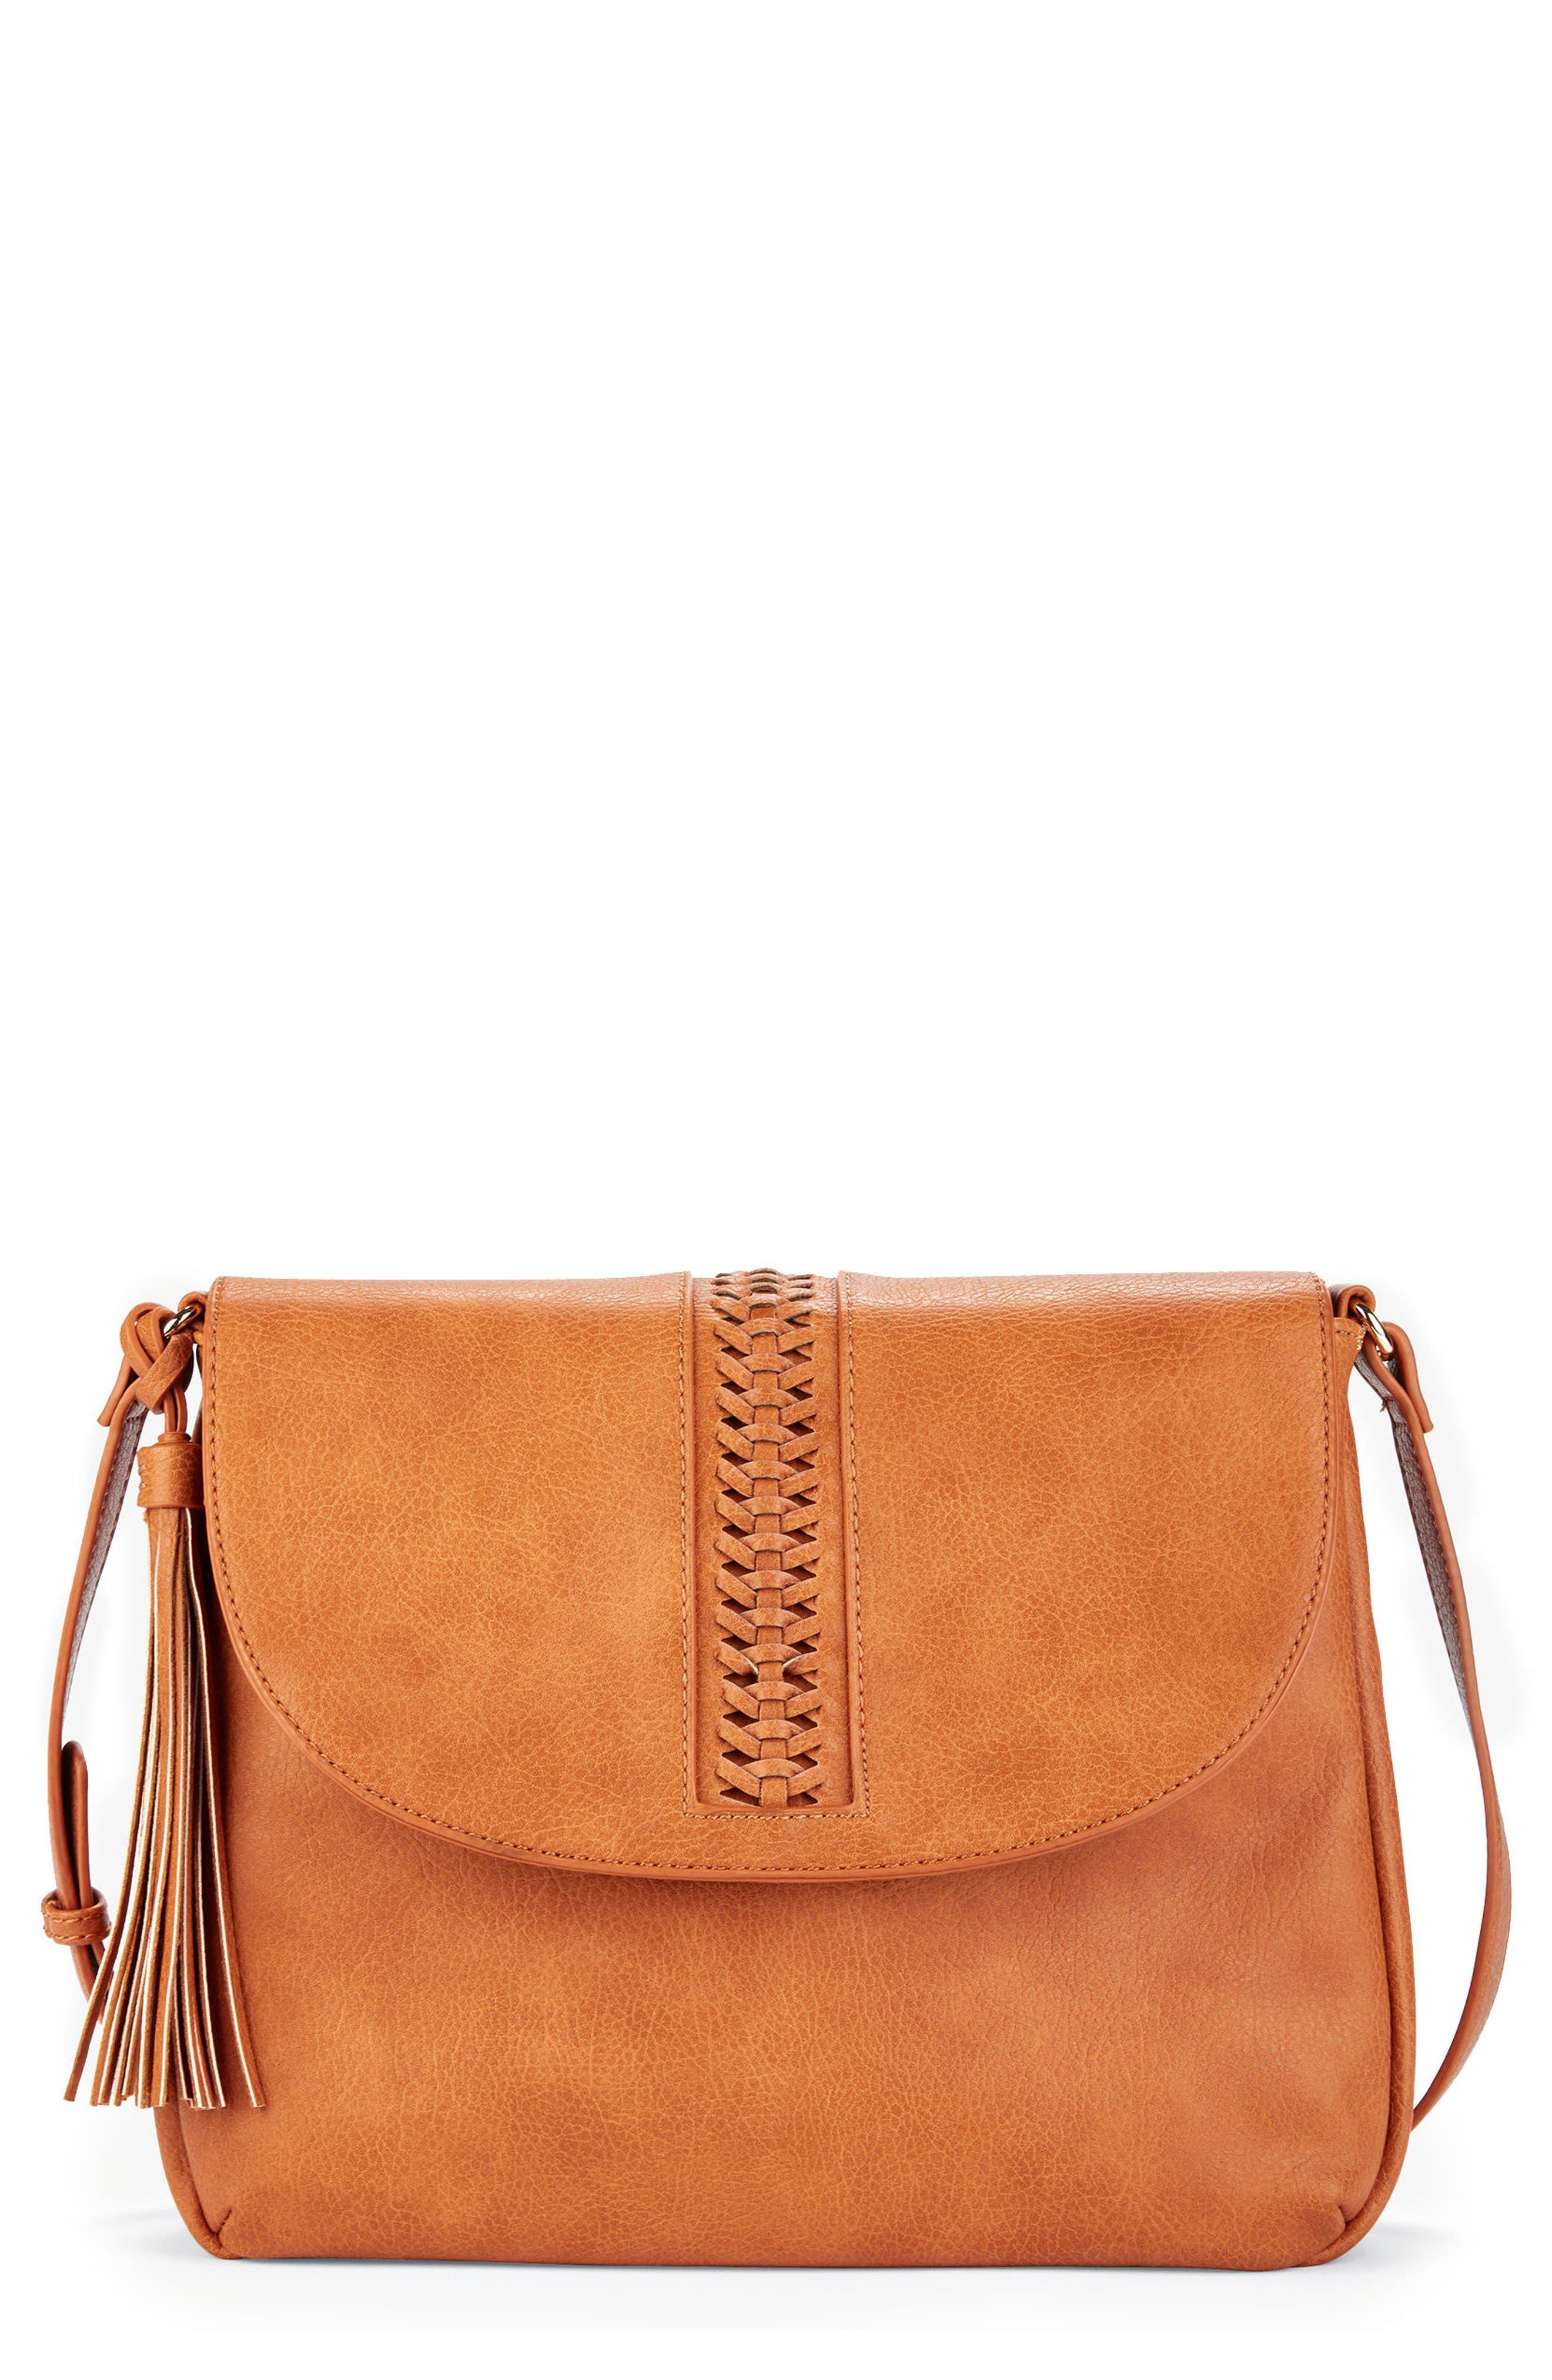 Tara Stitch Detail Faux Leather Crossbody Bag,                             Main thumbnail 1, color,                             Cognac